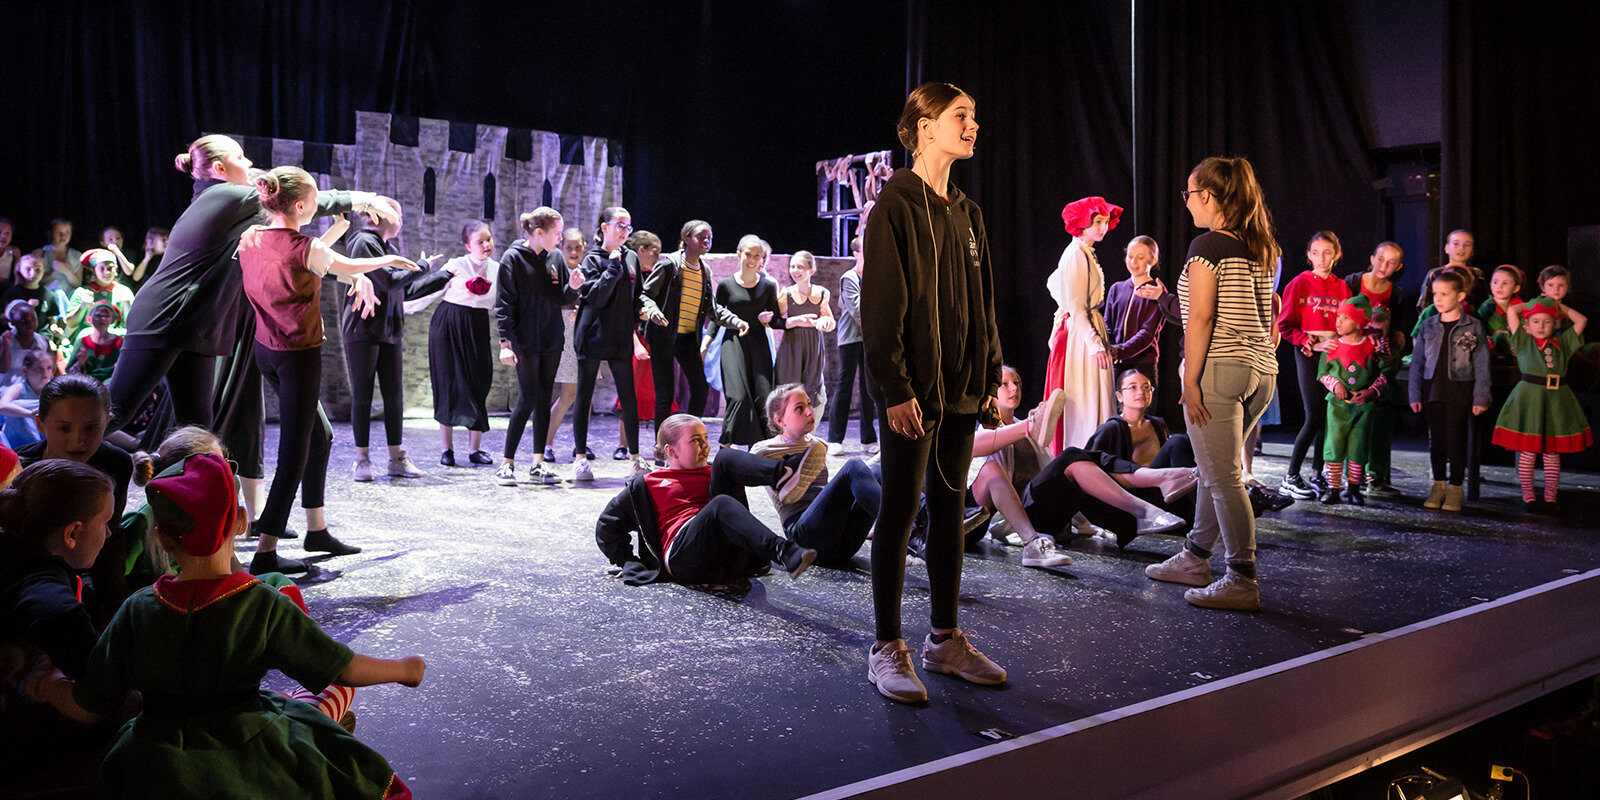 Arts1 Evening & Weekend Class: Acting